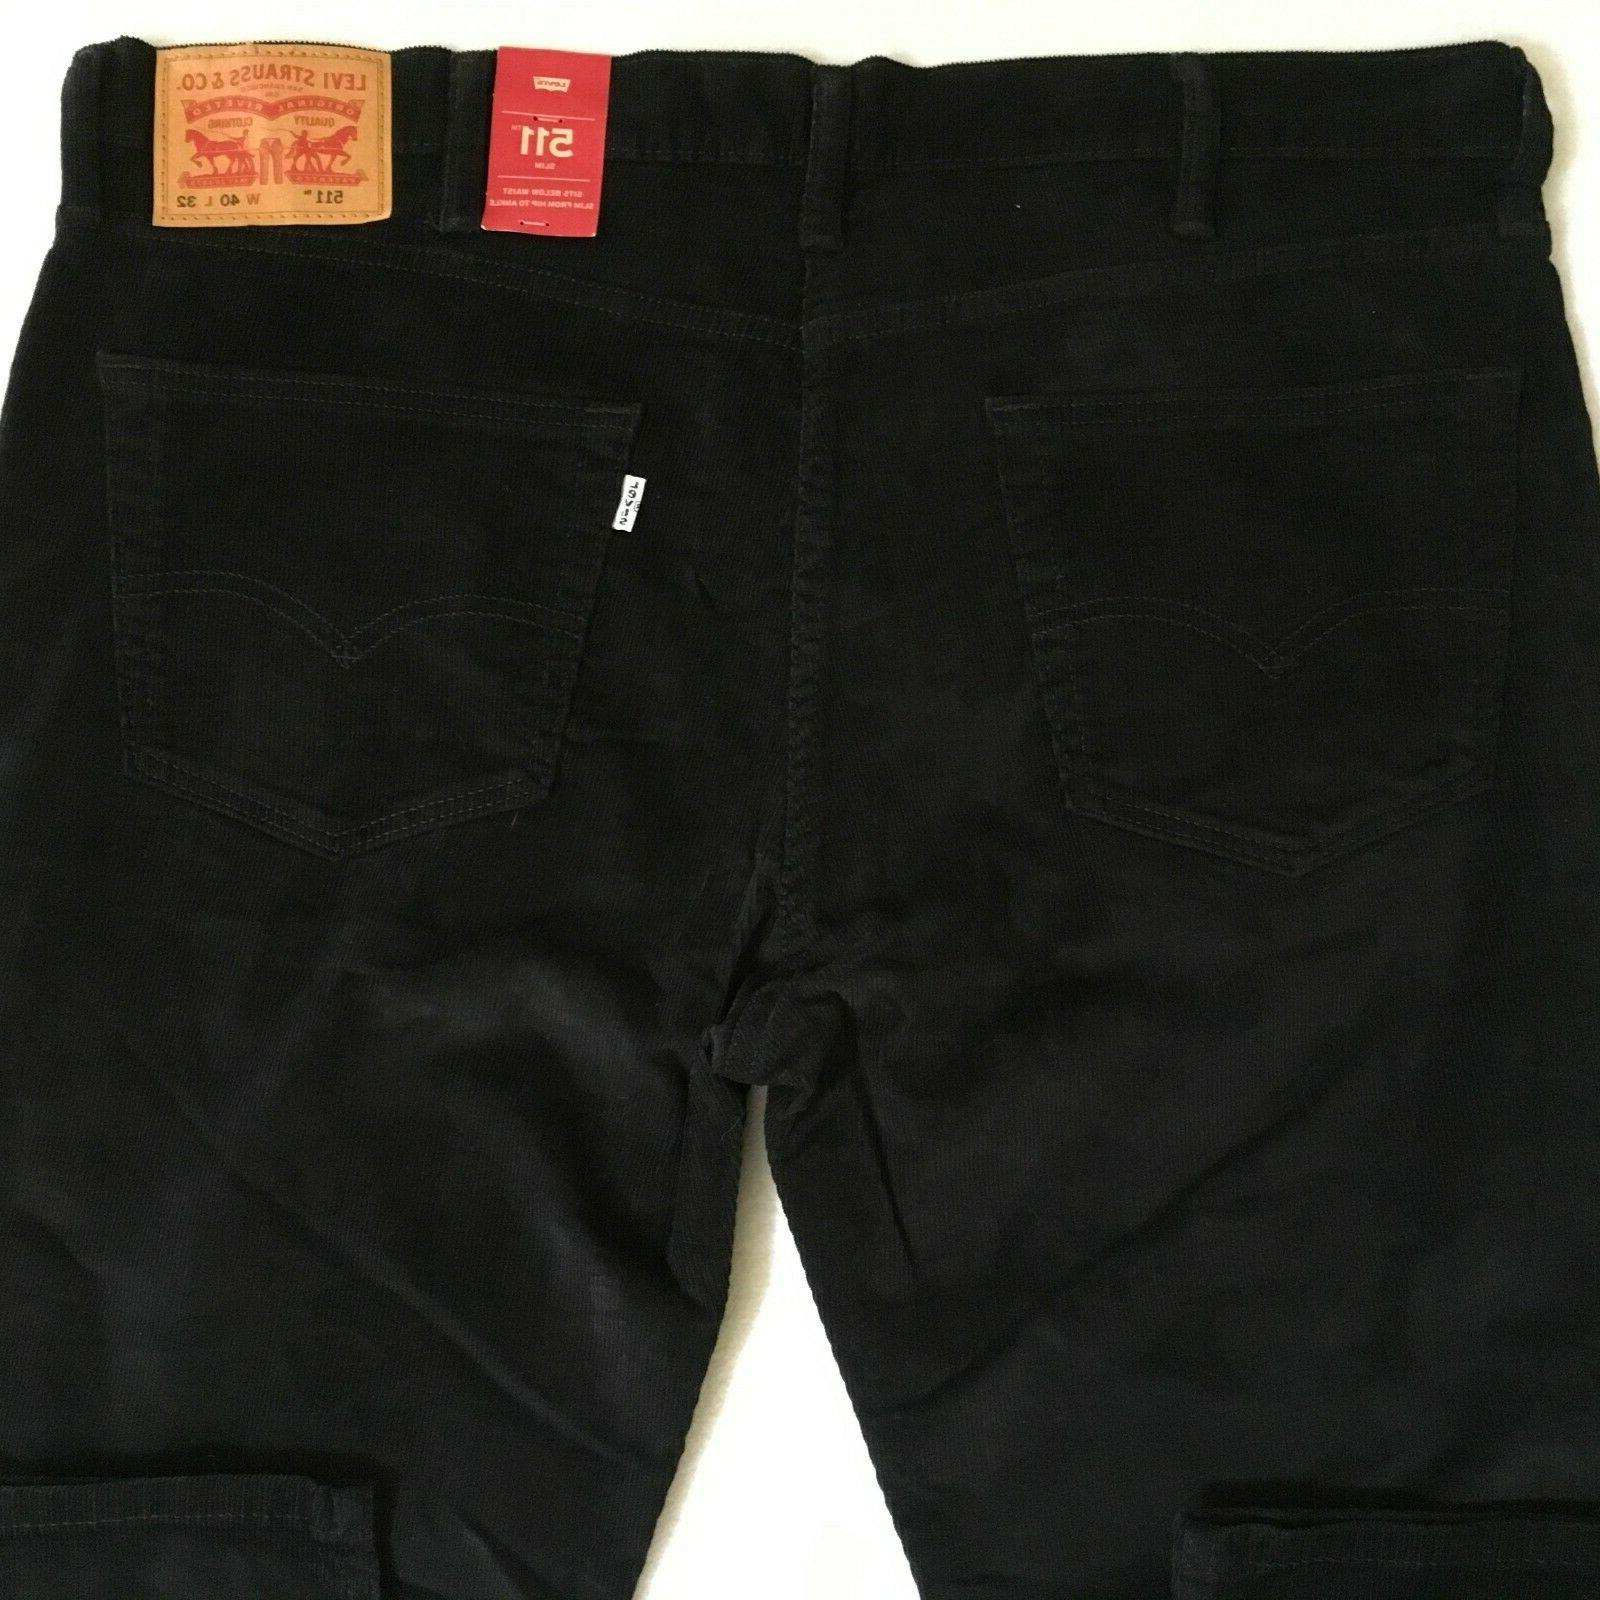 Levis 511 Slim Fit Stretch Pants 40x32 NWT $69.50